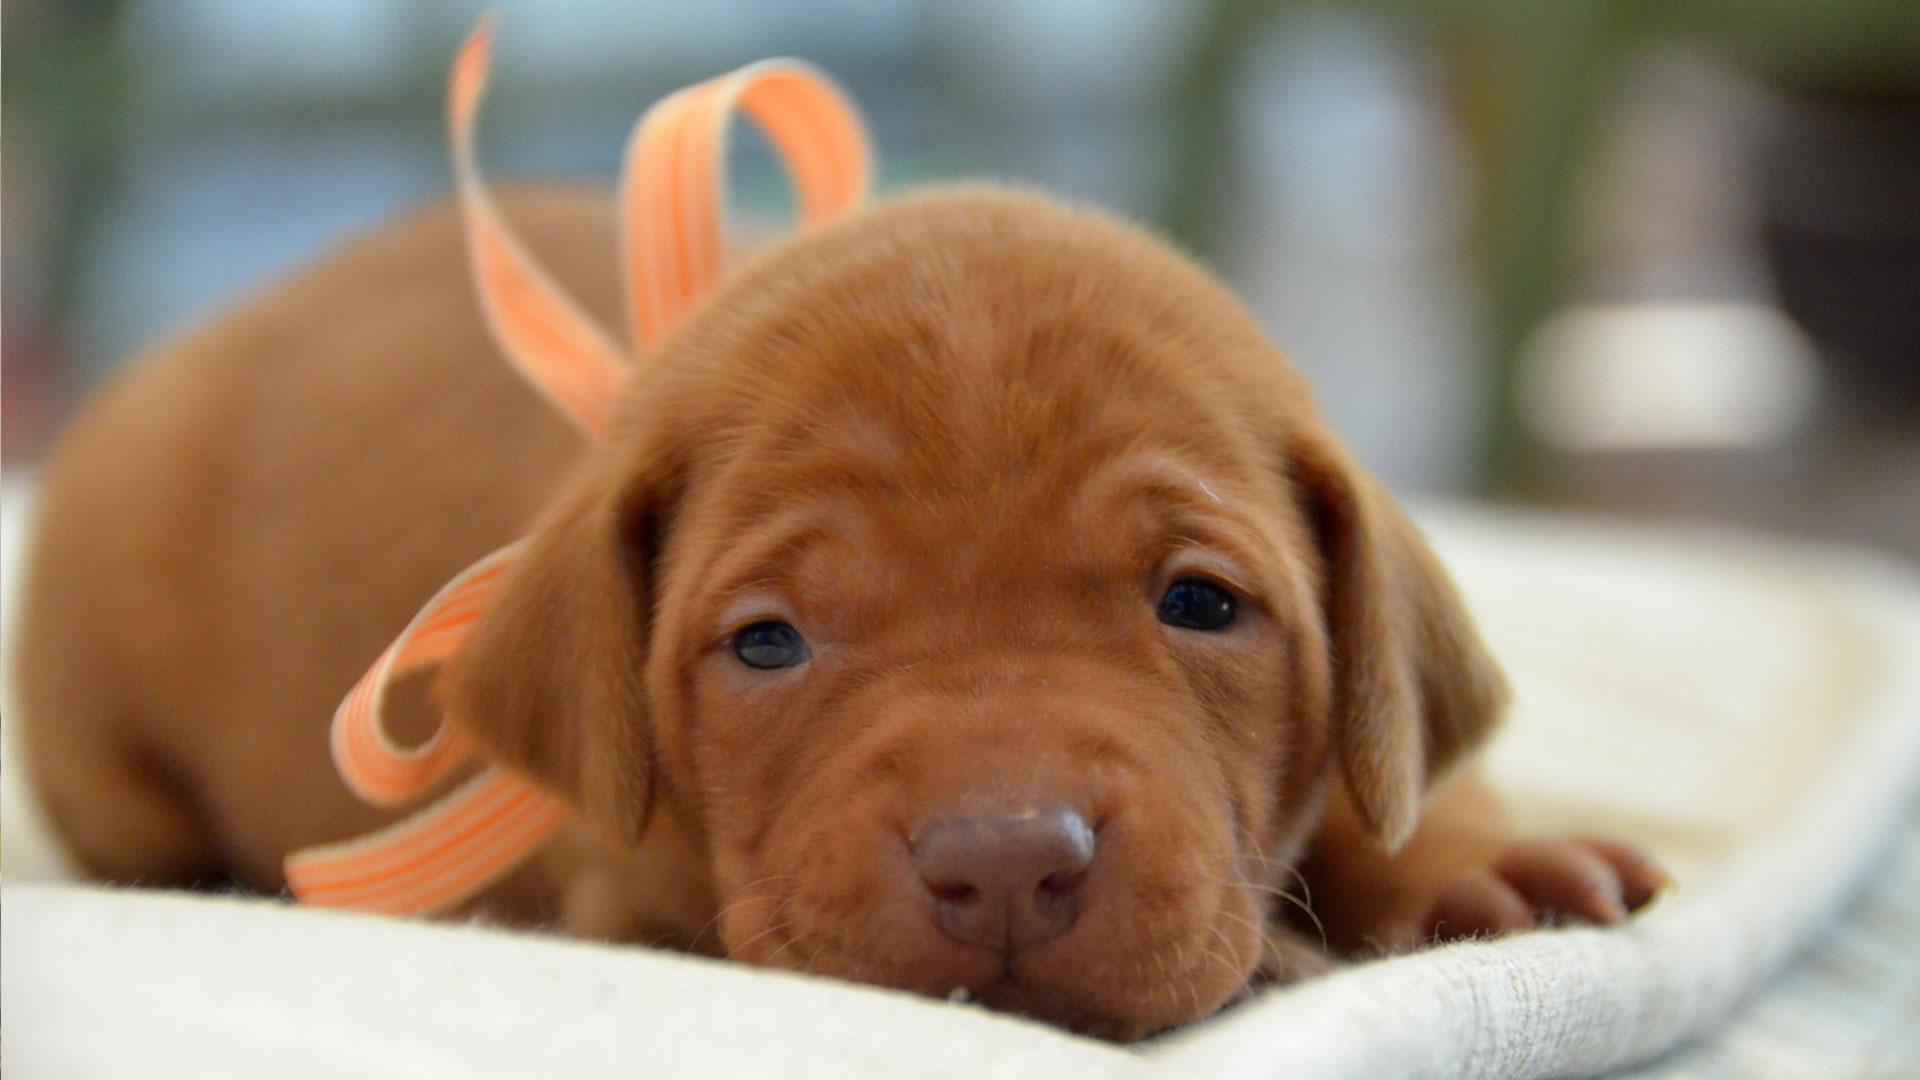 Adorable puppy | Sheknows.com